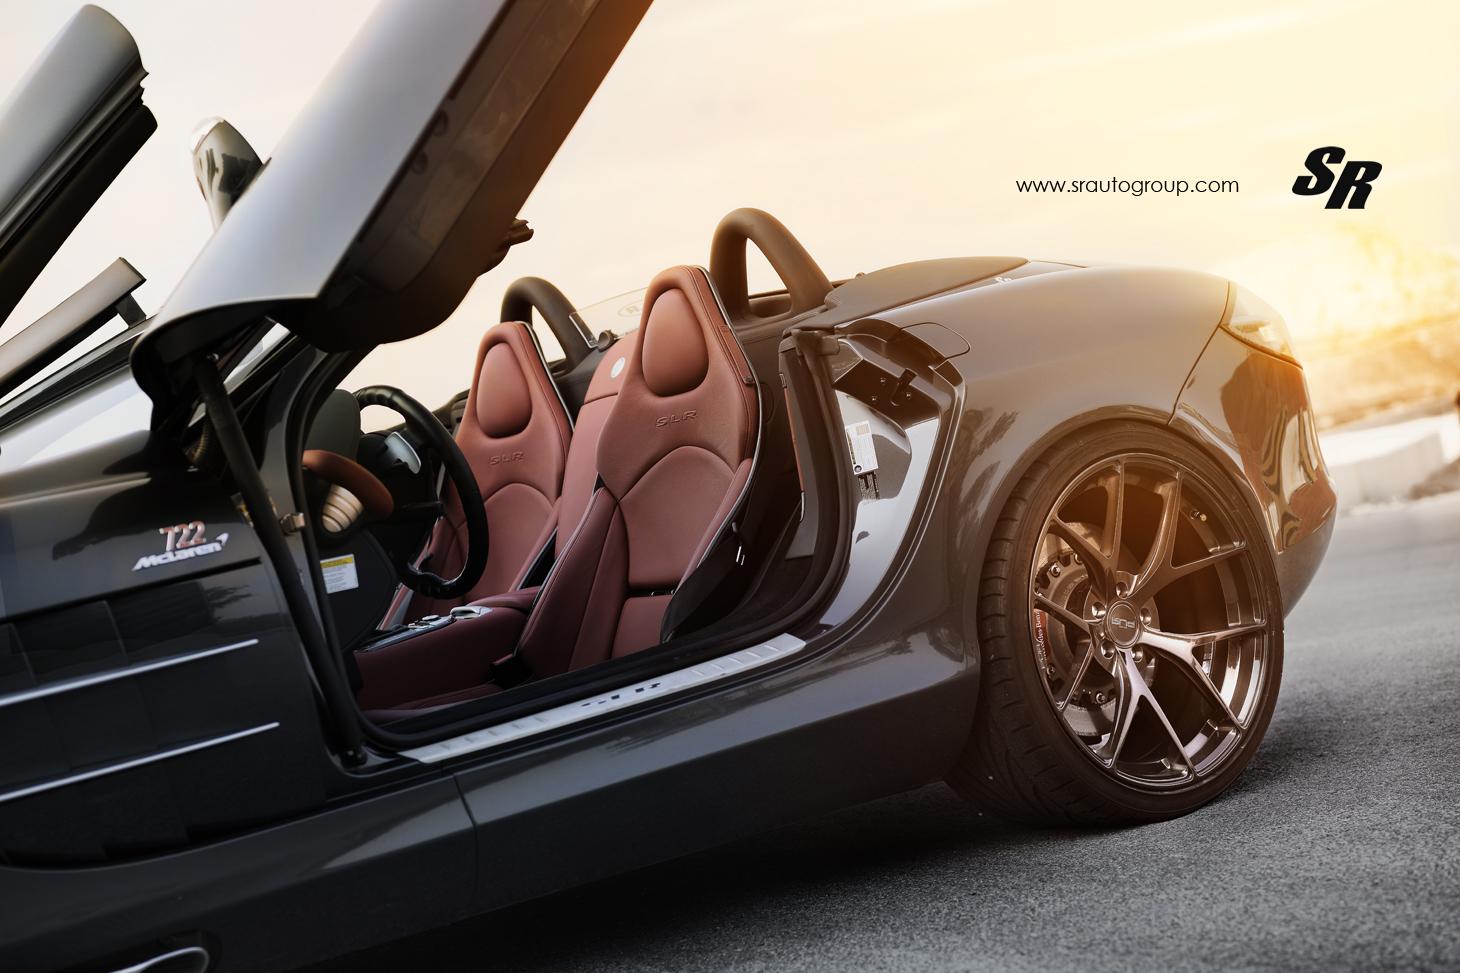 Mercedes-Benz SLR McLaren From China Looks Amazing - GTspirit on mercedes-benz s-class rims, mercedes-benz sls rims, nissan gt-r rims, mercedes-benz ml350 rims, mercedes-benz c250 rims, mercedes-benz gl550 rims, mercedes-benz w126 rims, mercedes-benz gl450 rims, mercedes-benz ml500 rims, mclaren p1 rims, mercedes-benz custom rims, mercedes-benz c230 rims, mercedes-benz clk550 rims, mercedes-benz cls550 rims, mercedes-benz s420 rims, mercedes-benz gl-class rims, mercedes-benz r500 rims, mercedes-benz sl 63 amg, mclaren mp4-12c rims, mercedes-benz s65 amg rims,